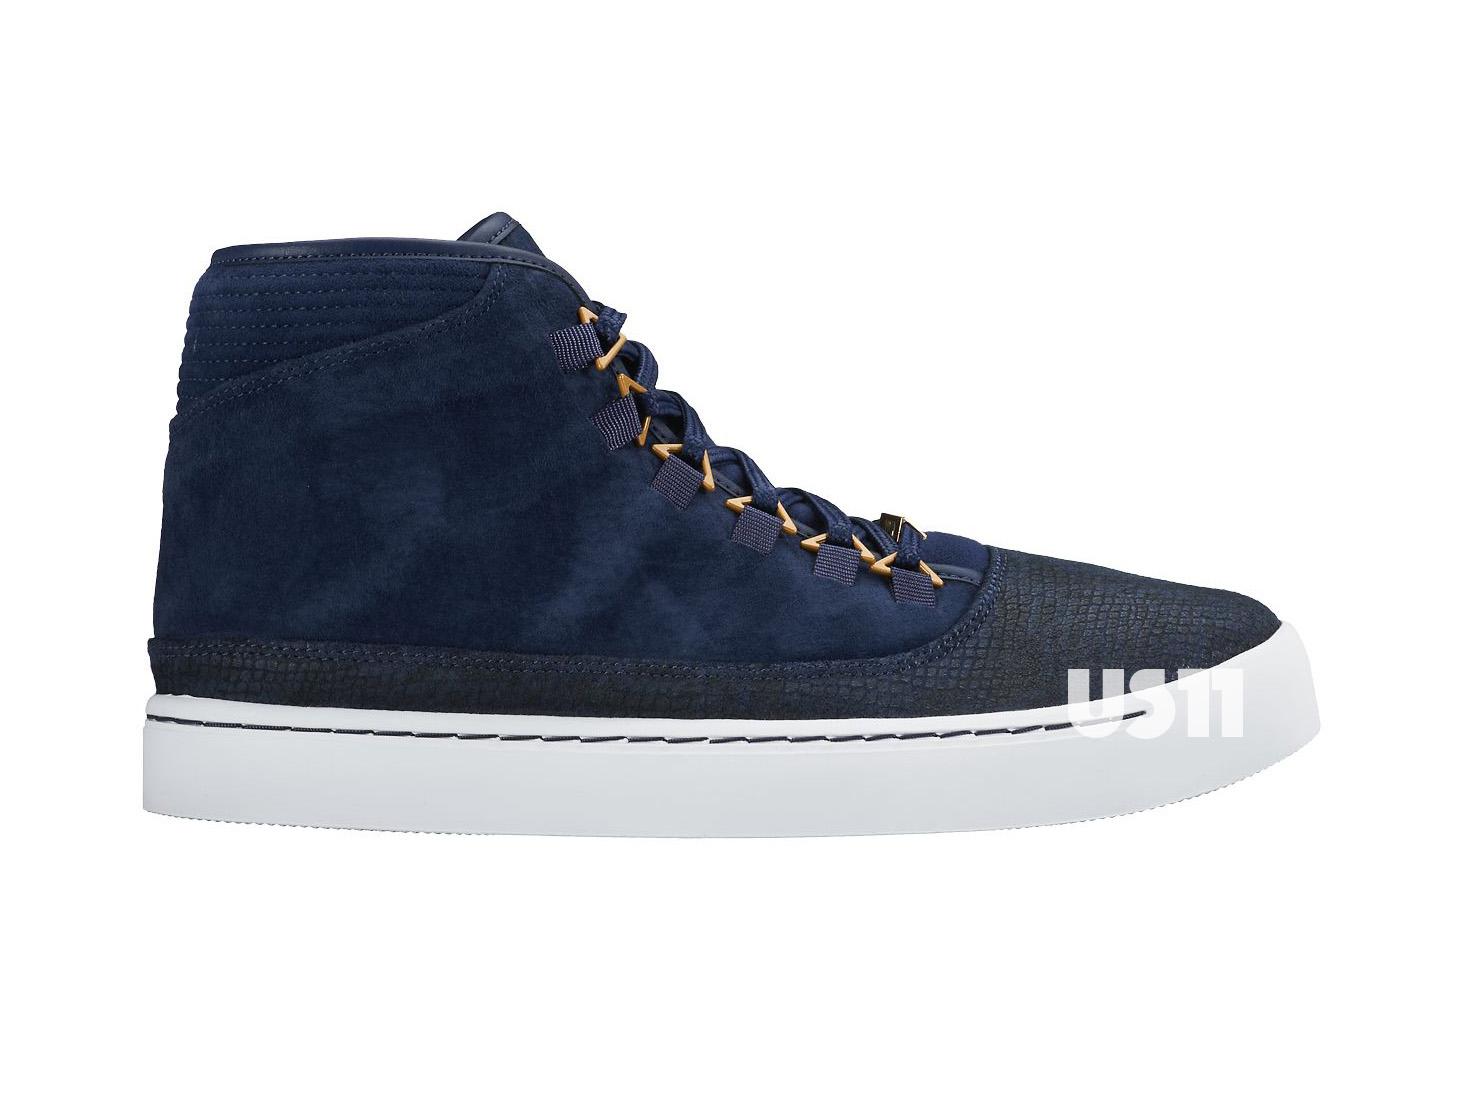 Jordan Brand Signature Shoe